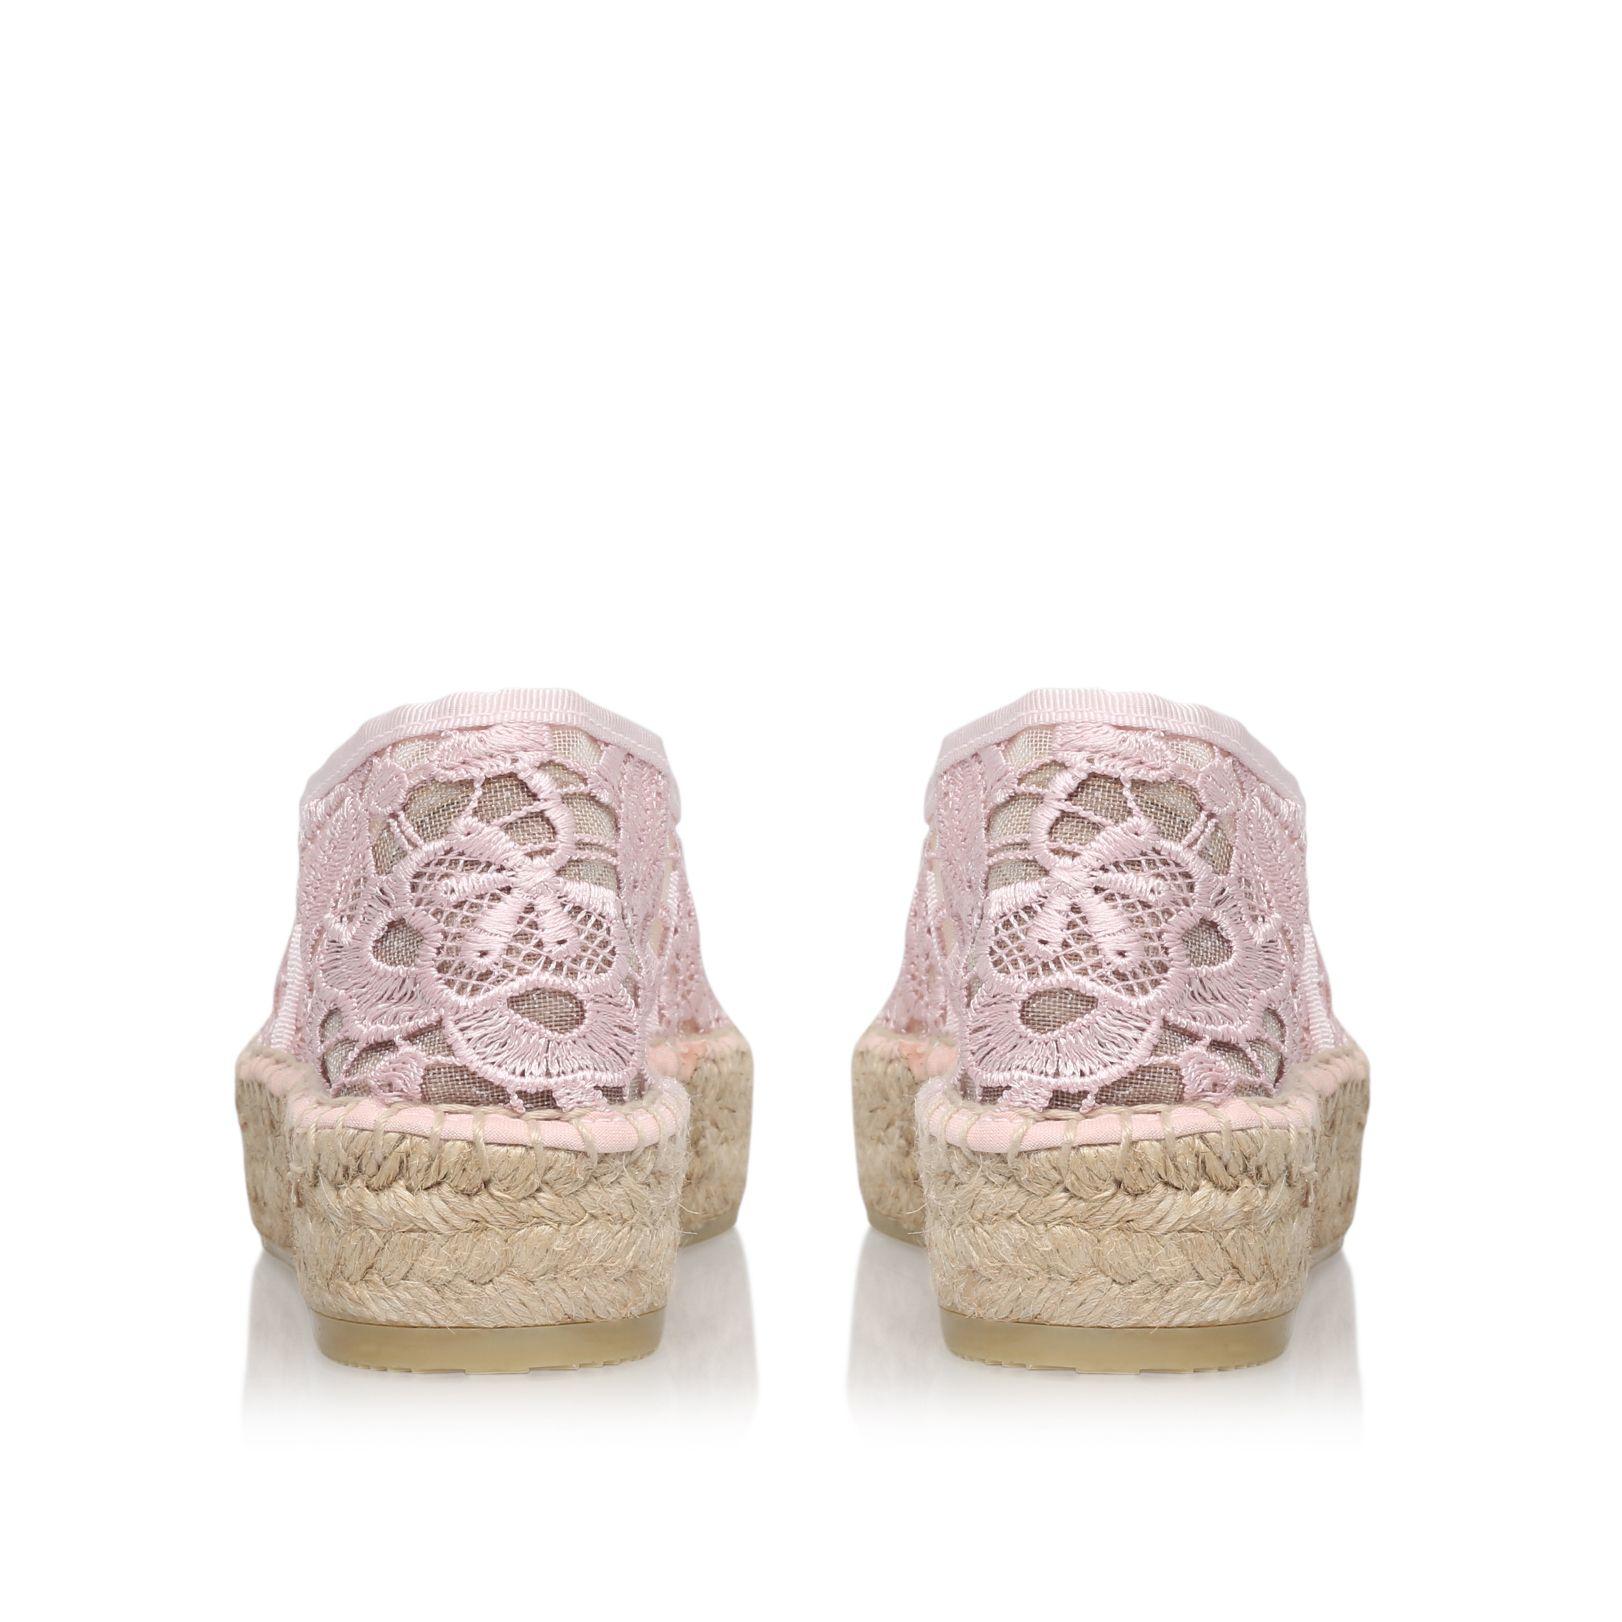 Kurt Geiger Synthetic Clova Flat Espadrille Sneakers in Pink